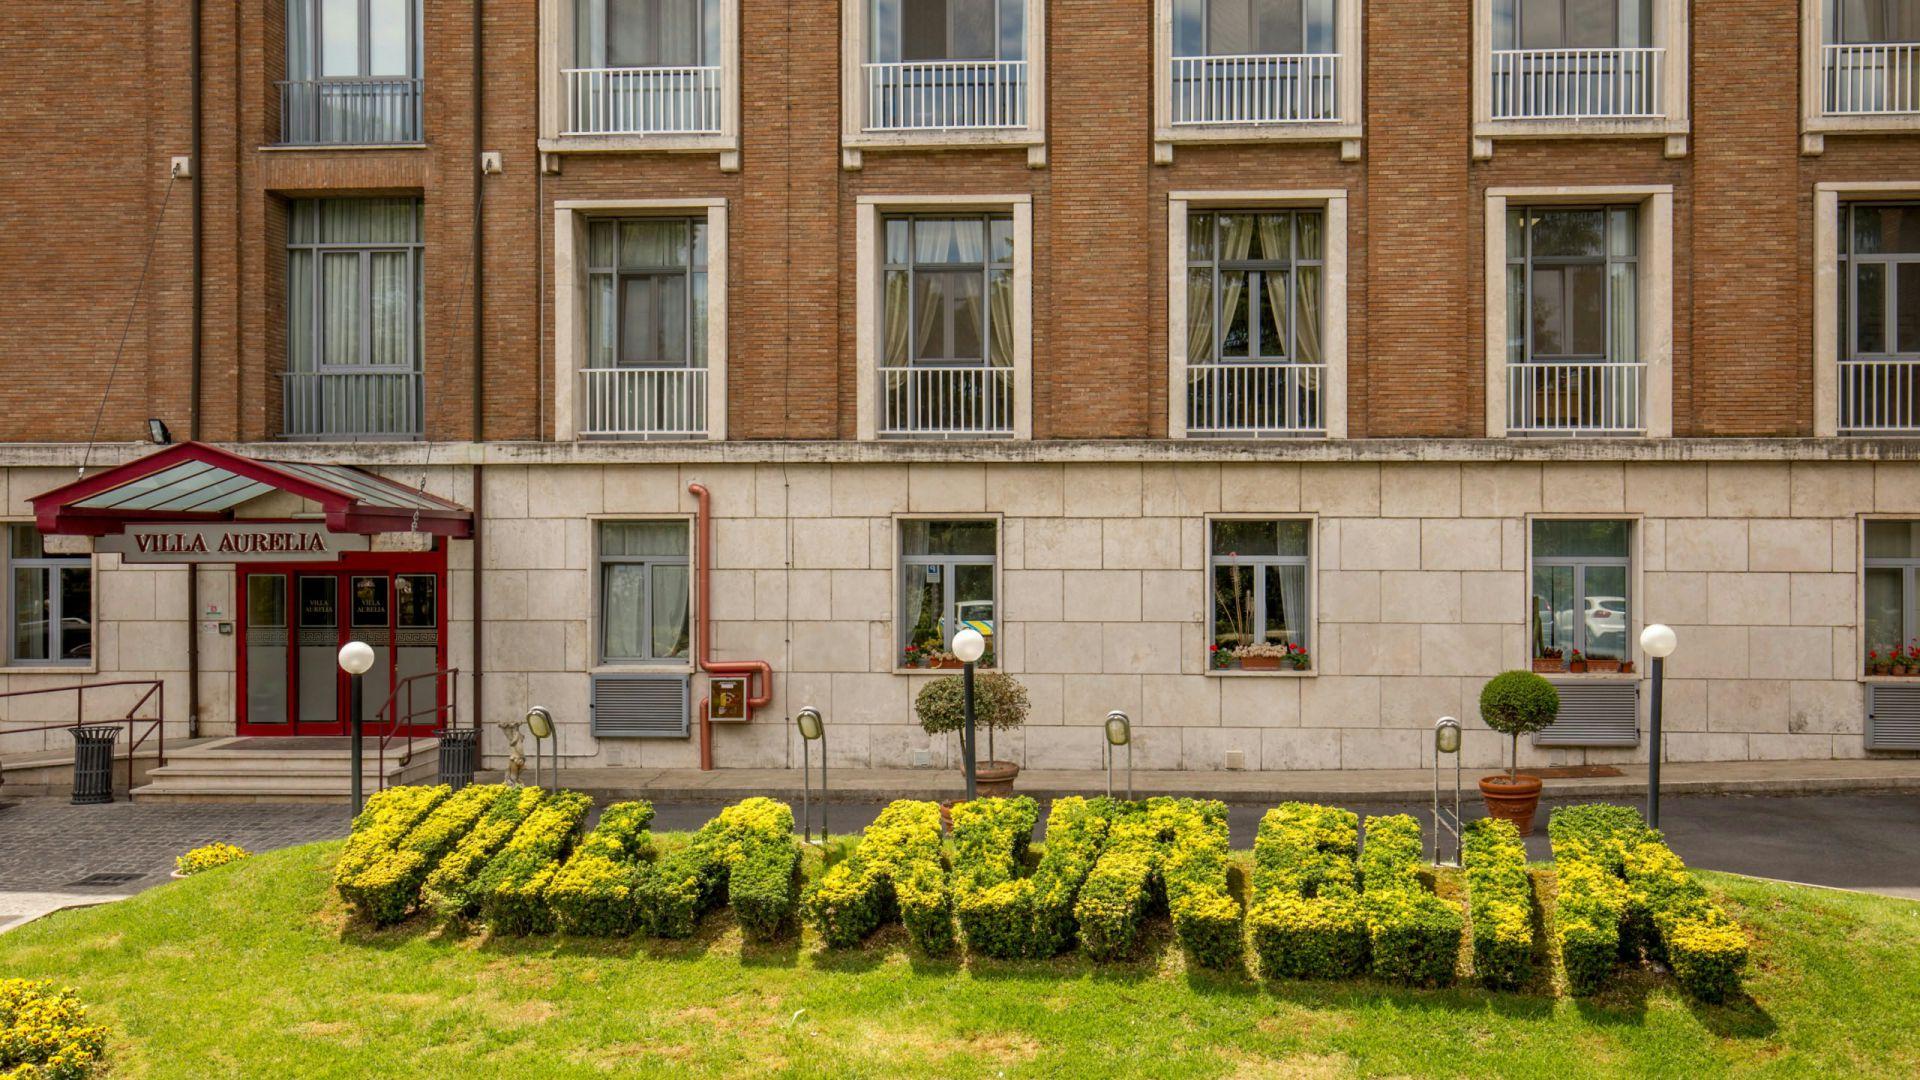 villa-aurelia-hotel-roma-externo-03